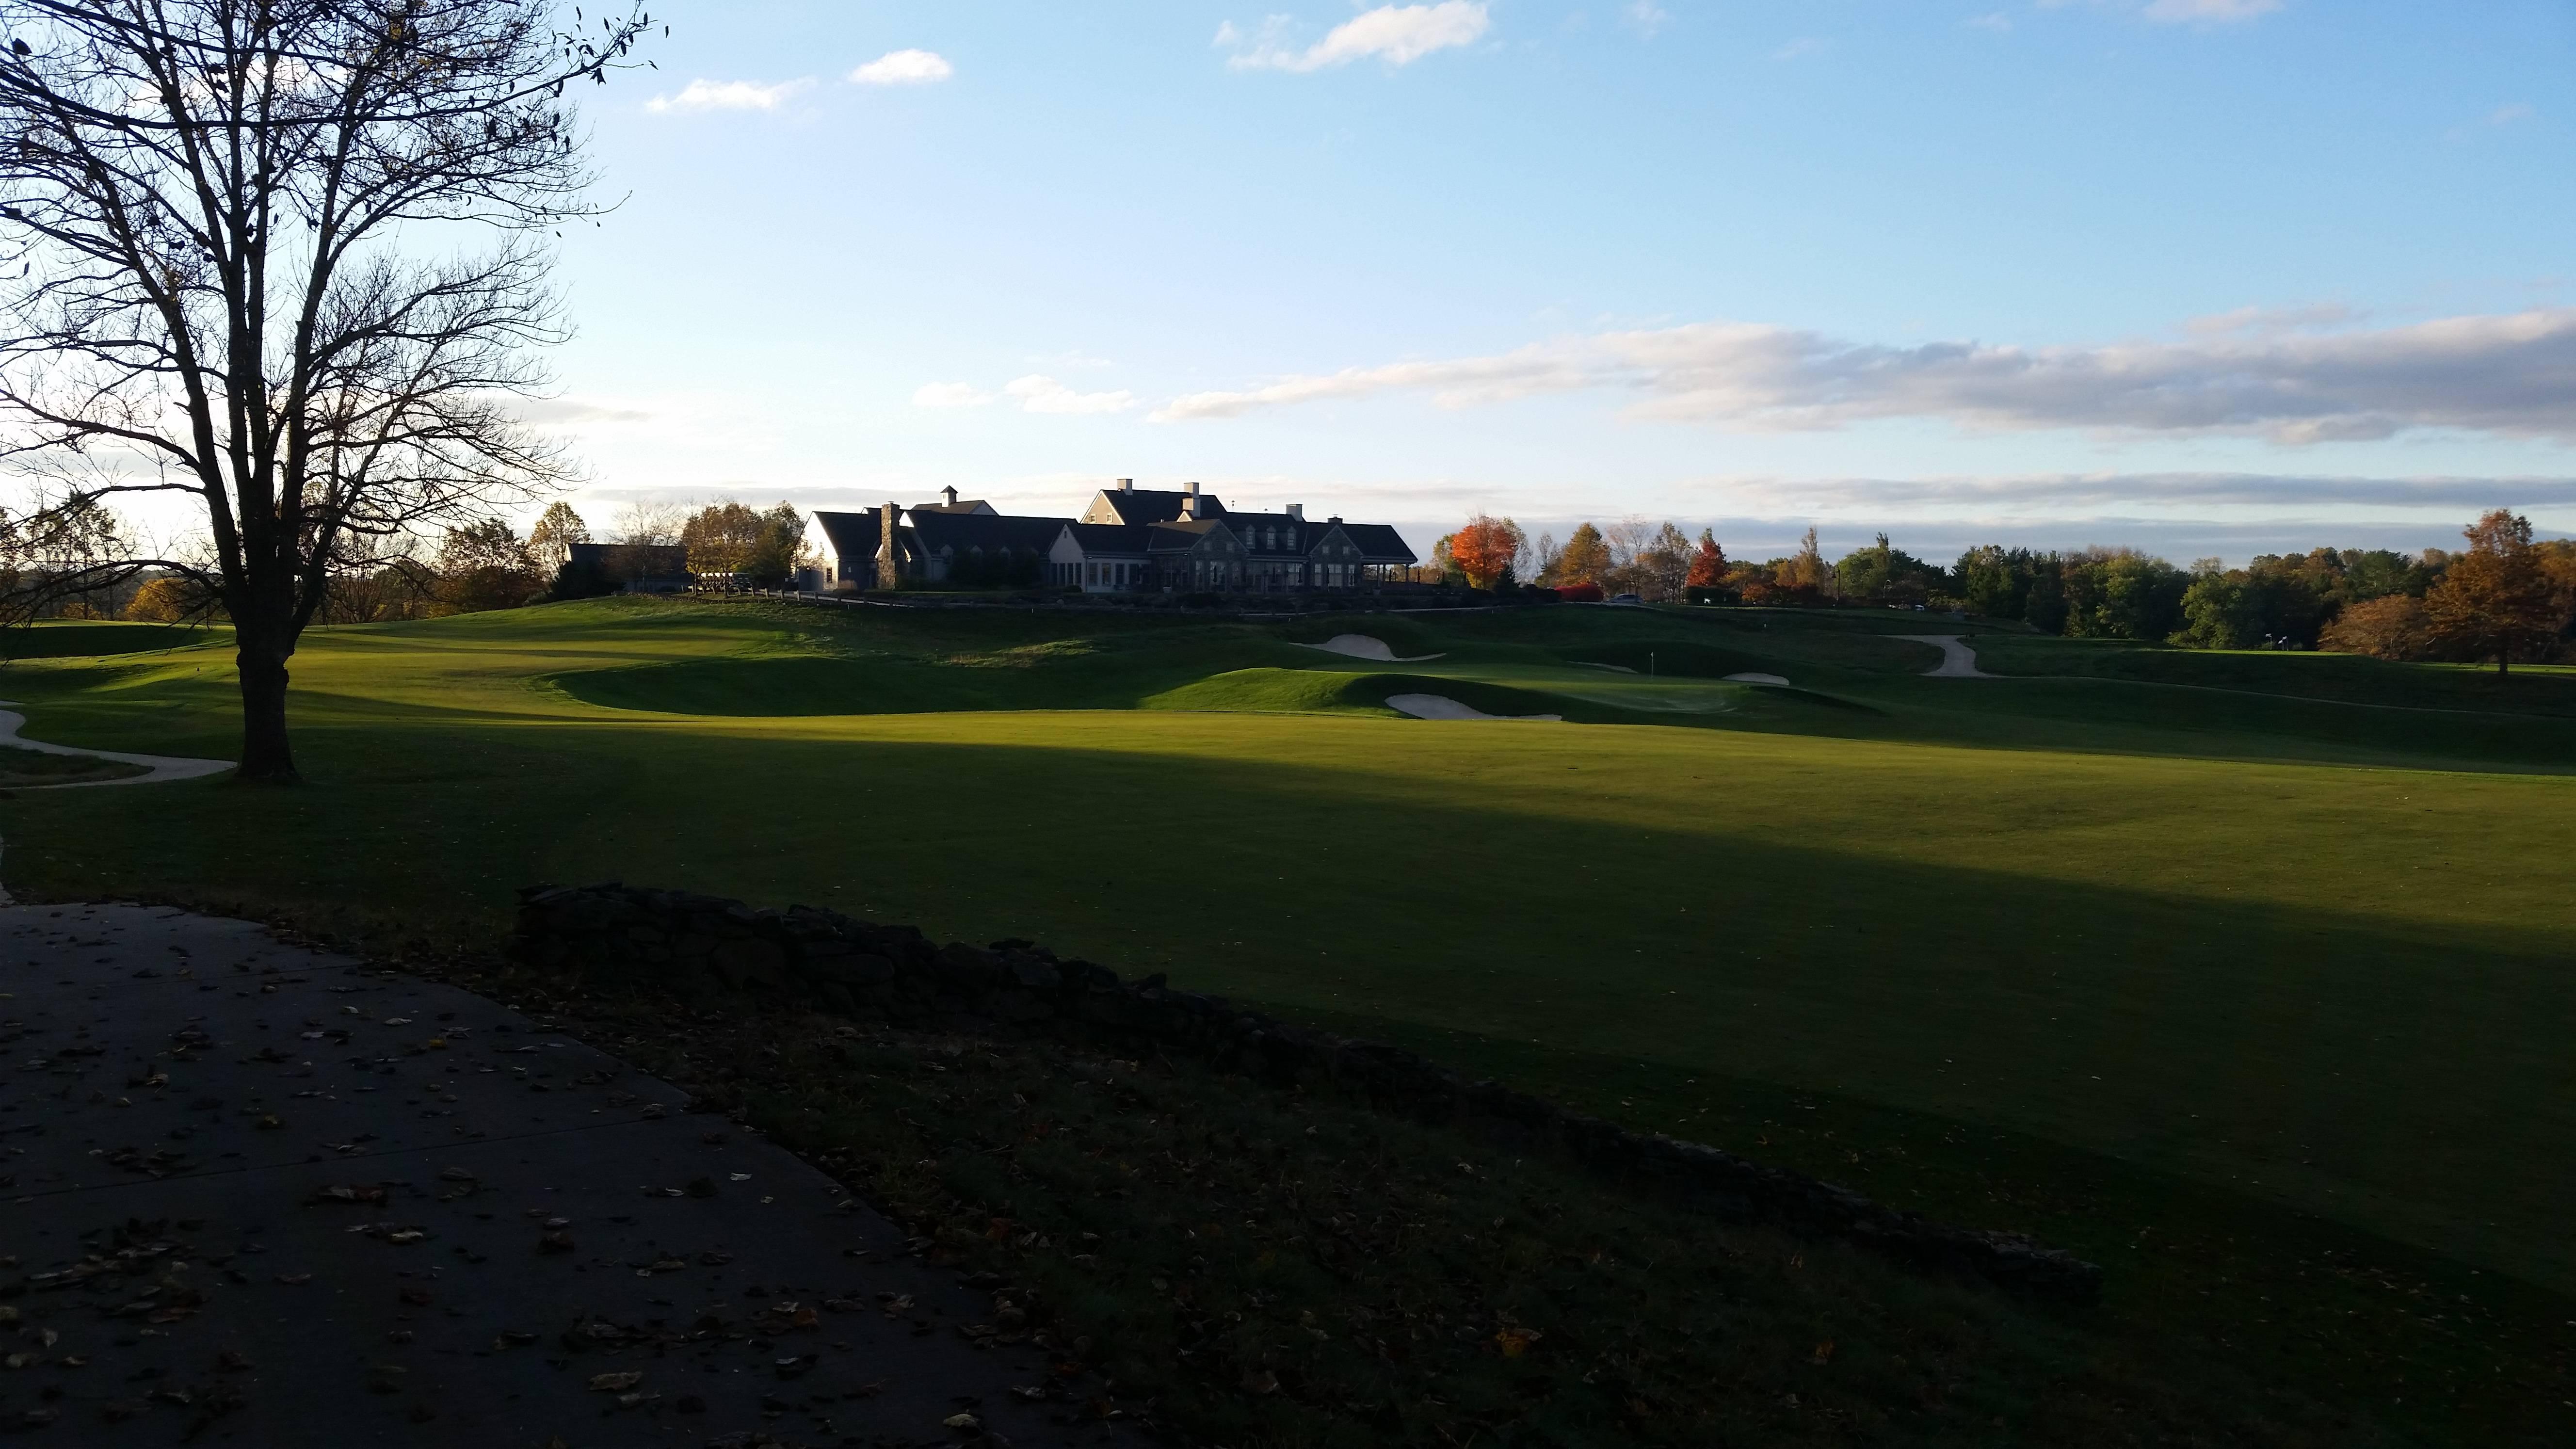 Fieldstone Golf Course : Walnut ridge greenville wilmington de real estate